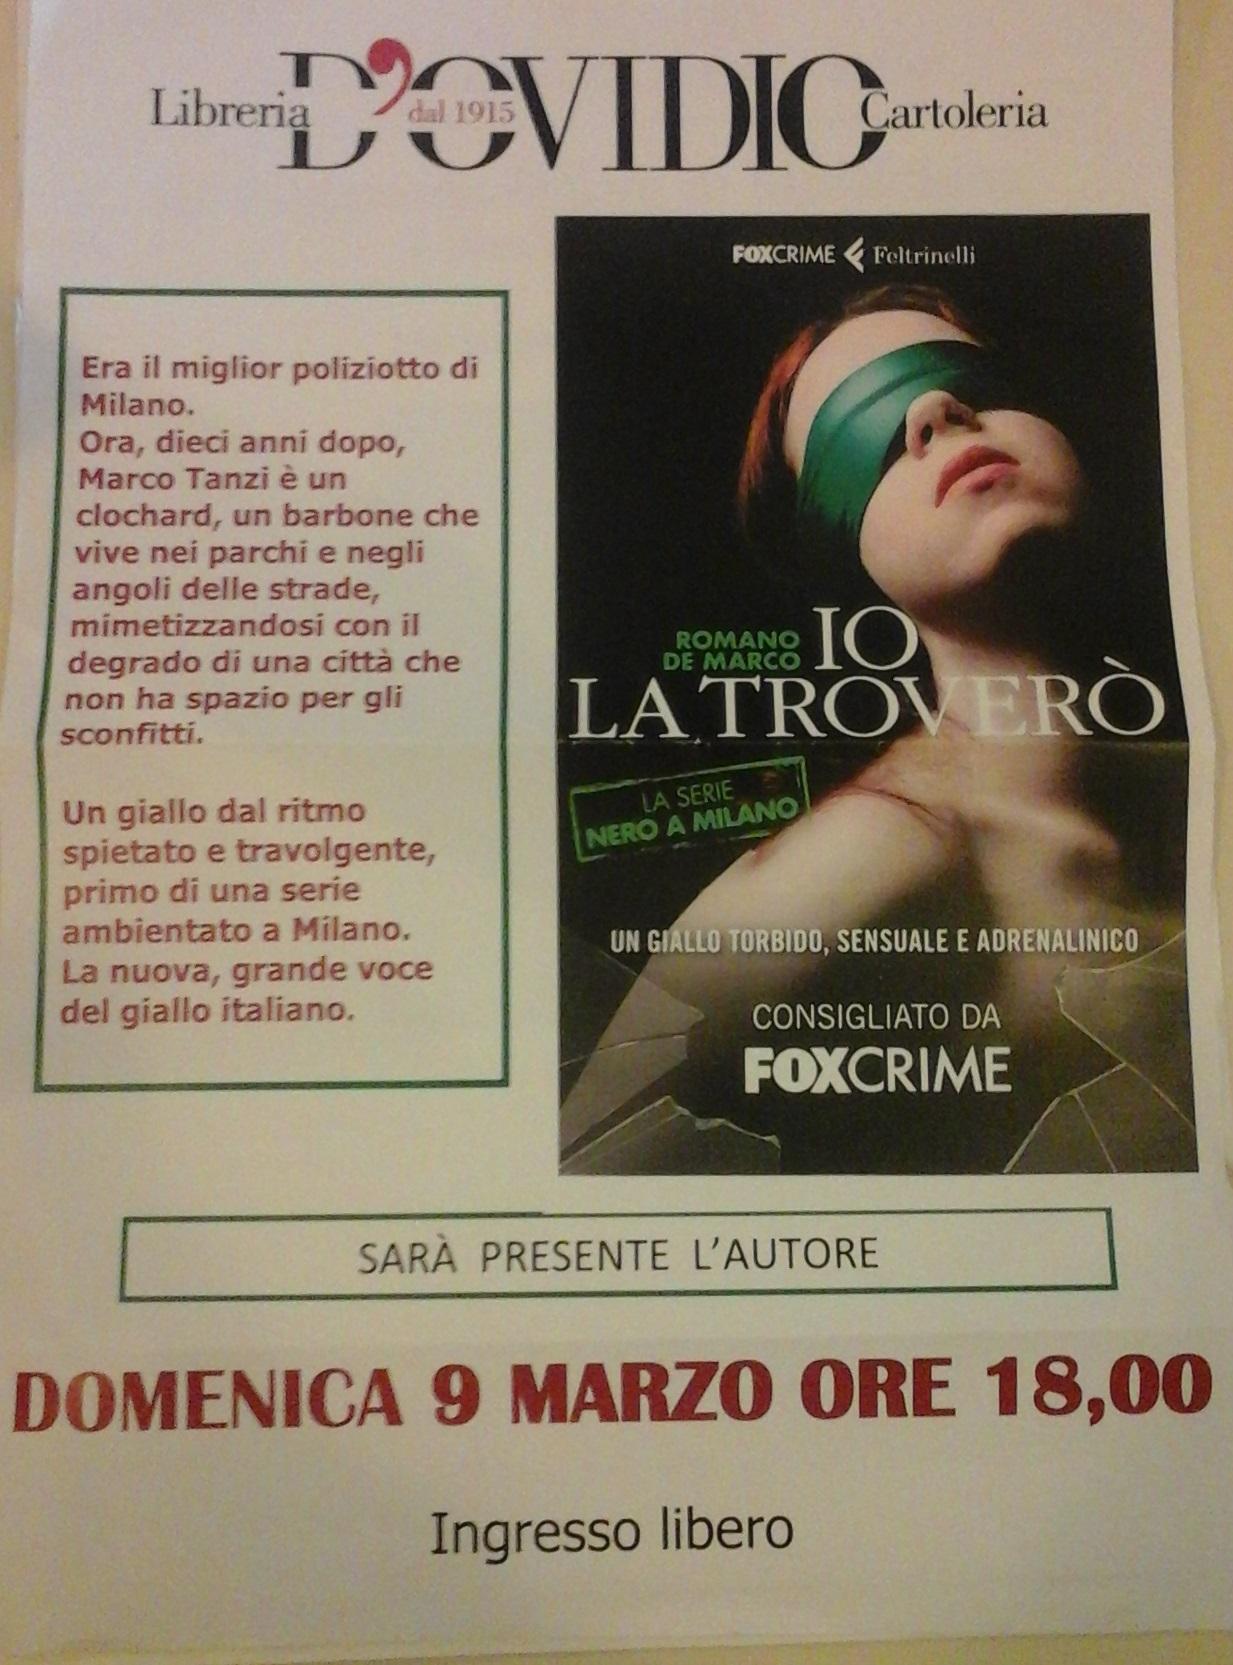 Romano De Marco.jpg